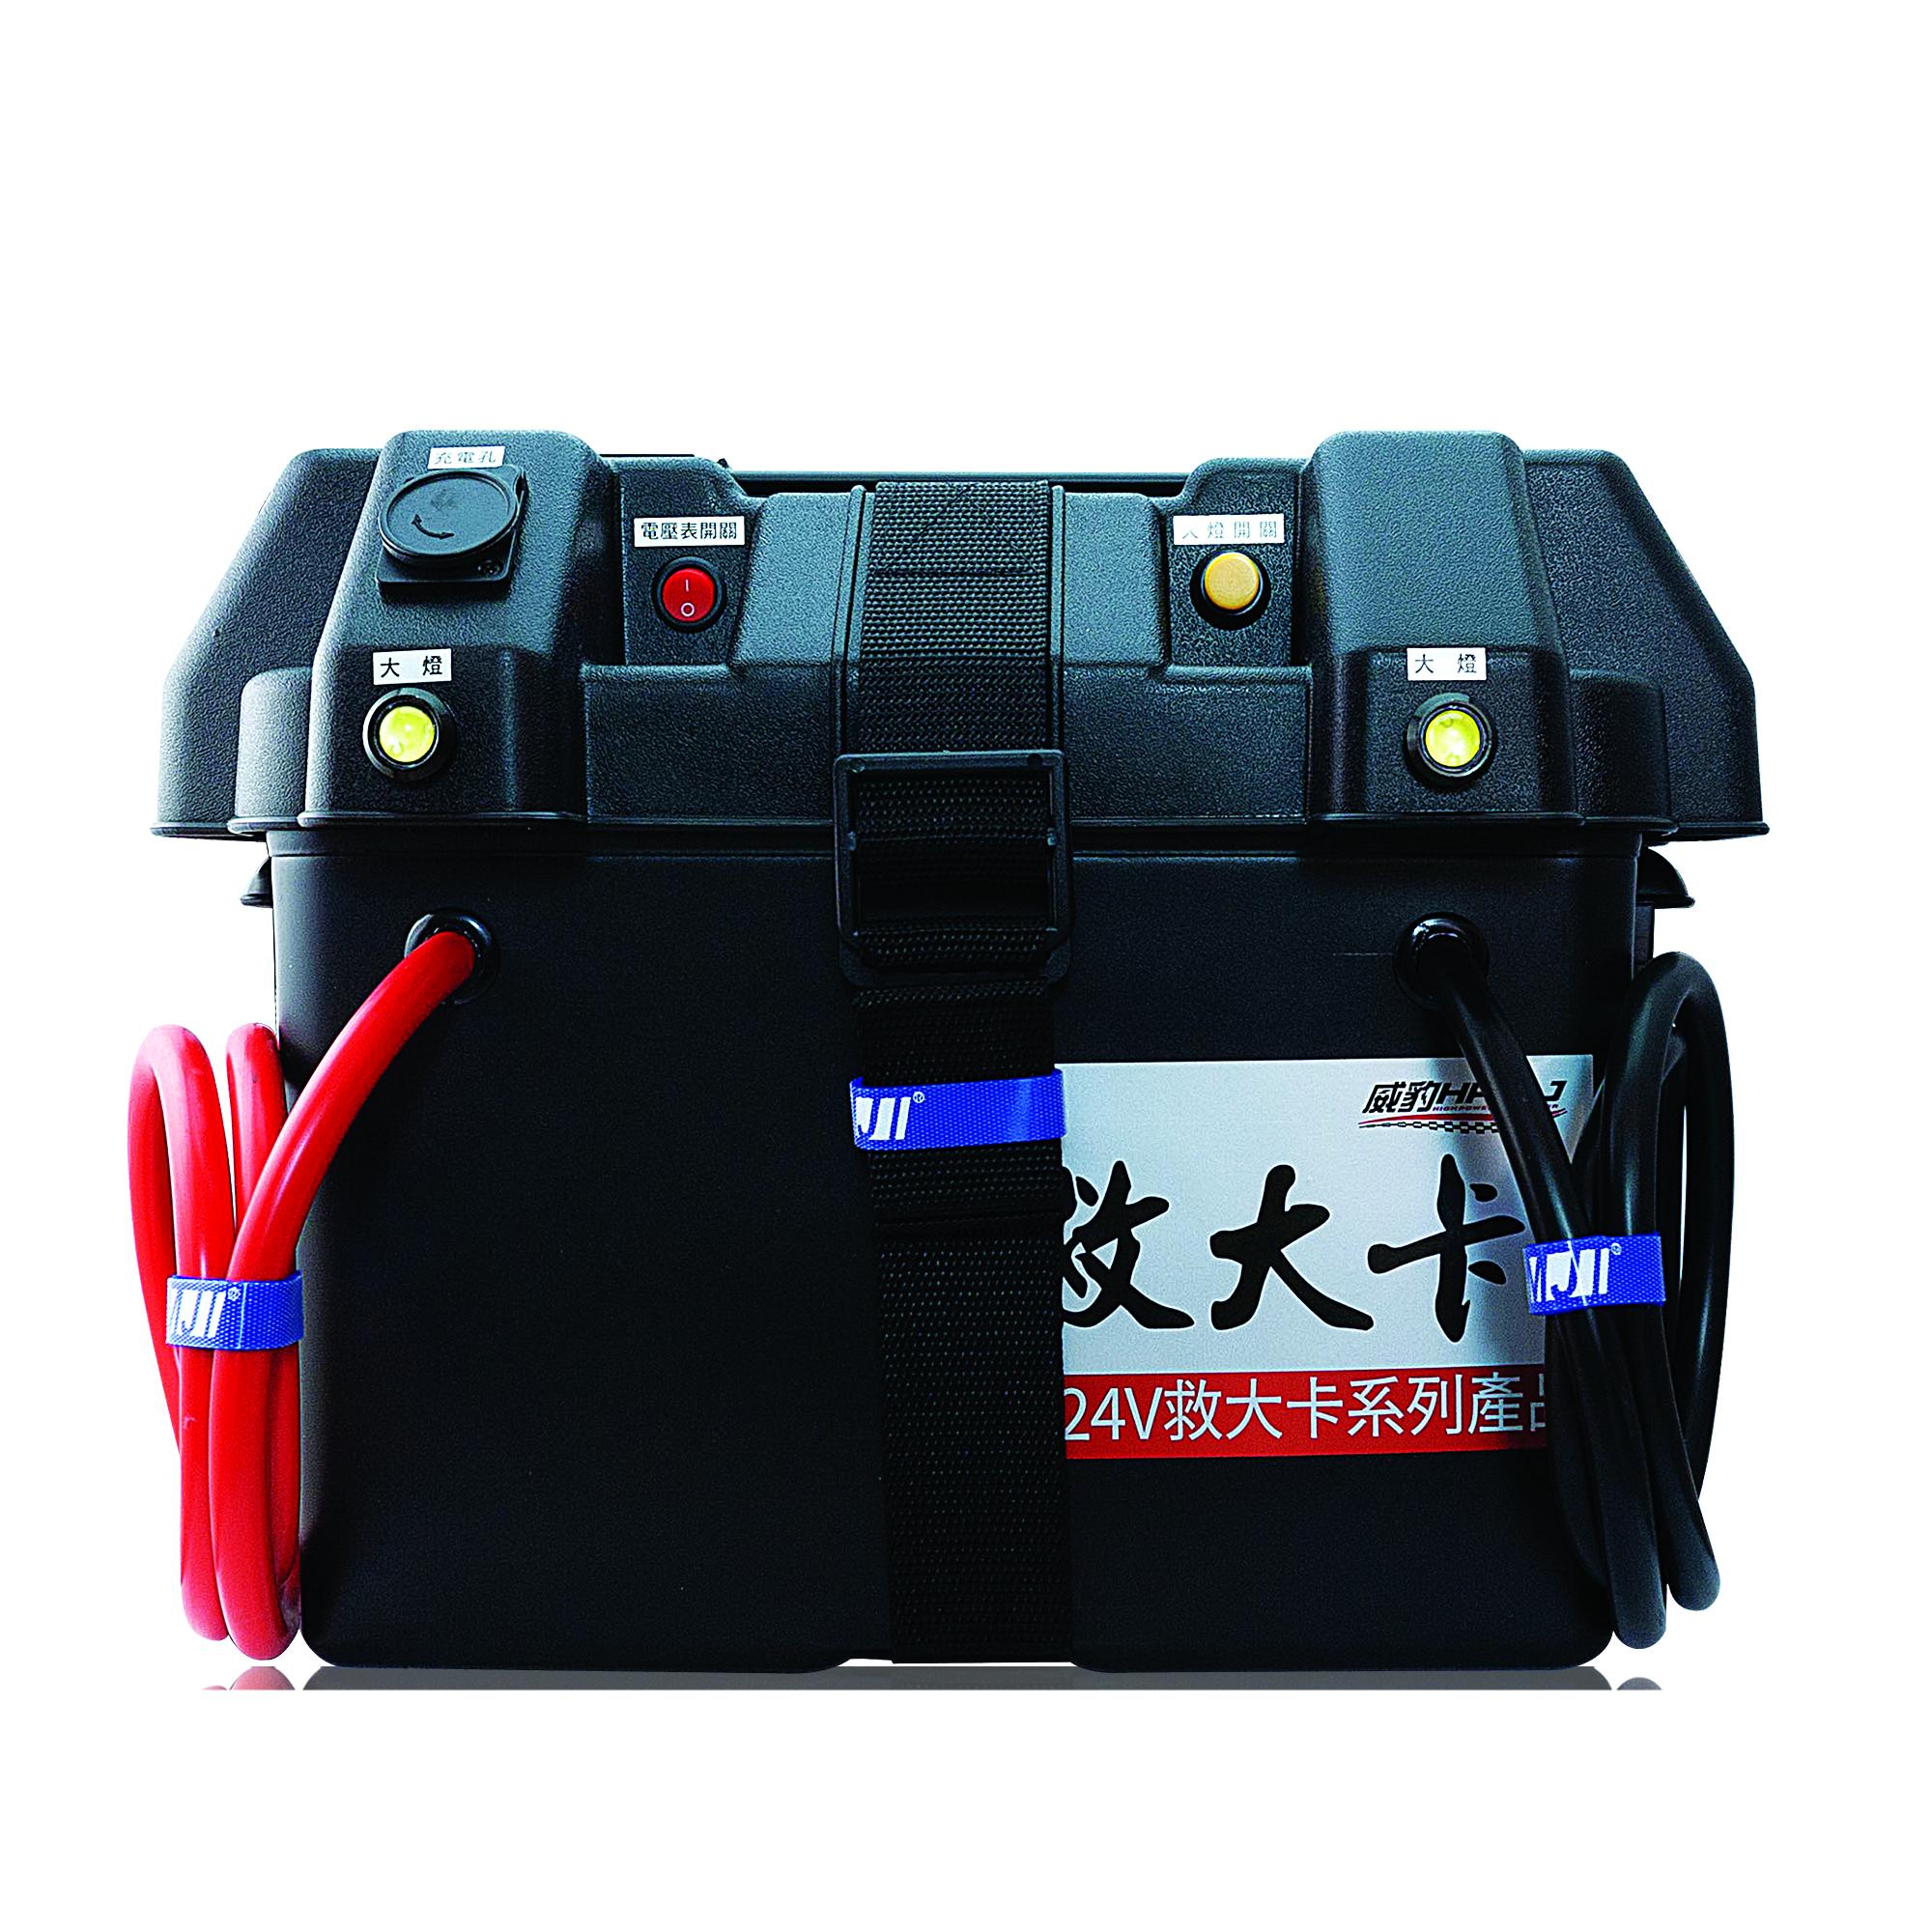 12+24V Heavy Duty Booster/Jump Starters/Emergency Car Starter/Emergency Power